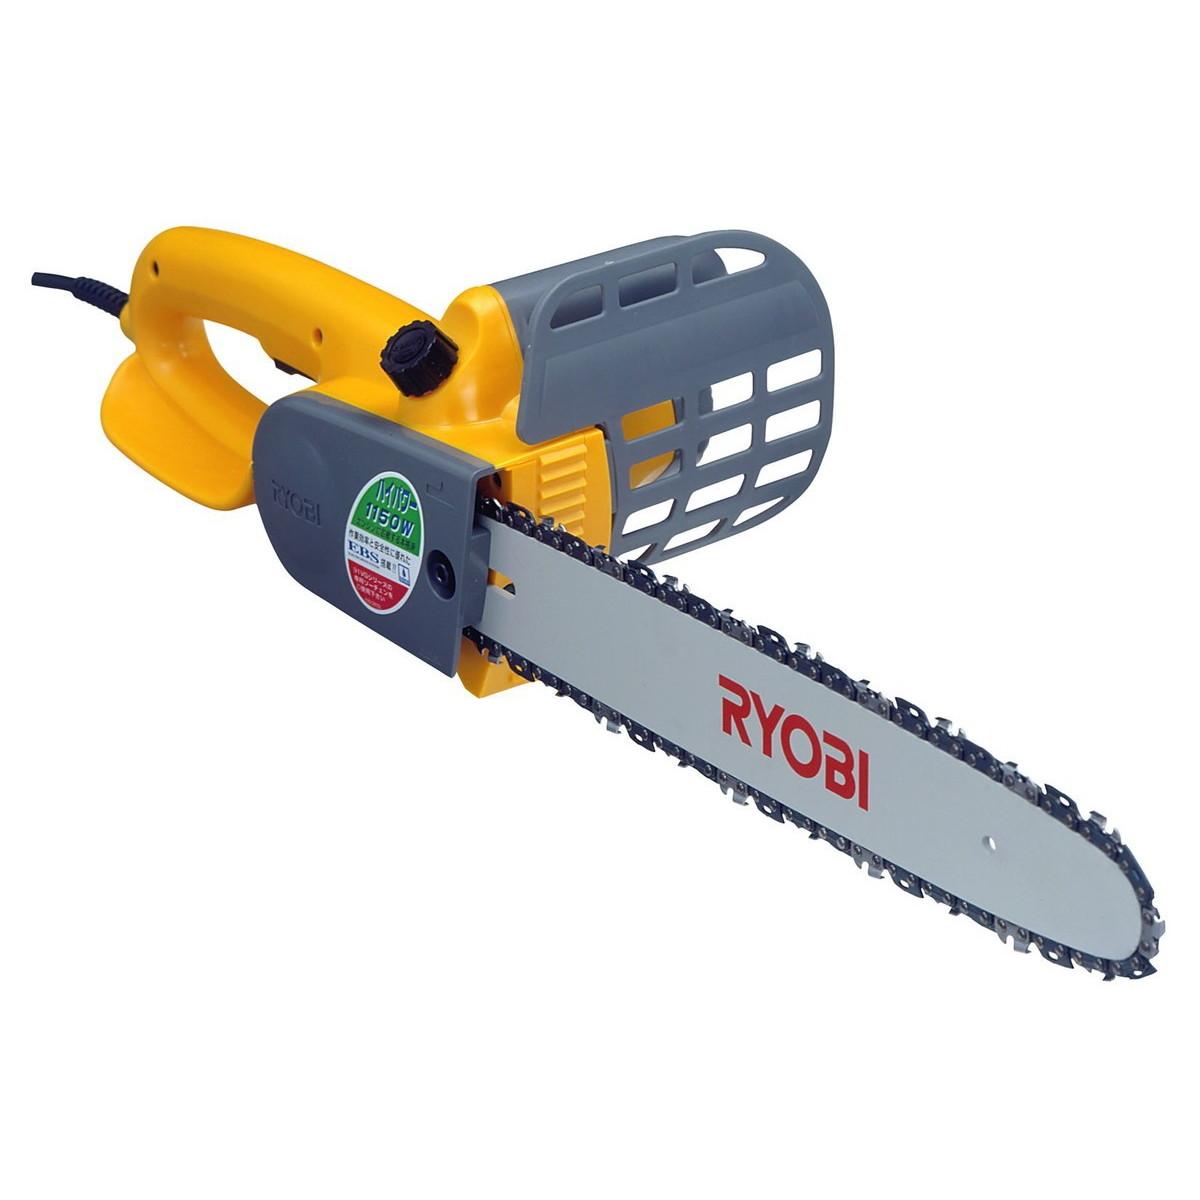 RYOBI/リョービ 電気チェンソー CS-3610S